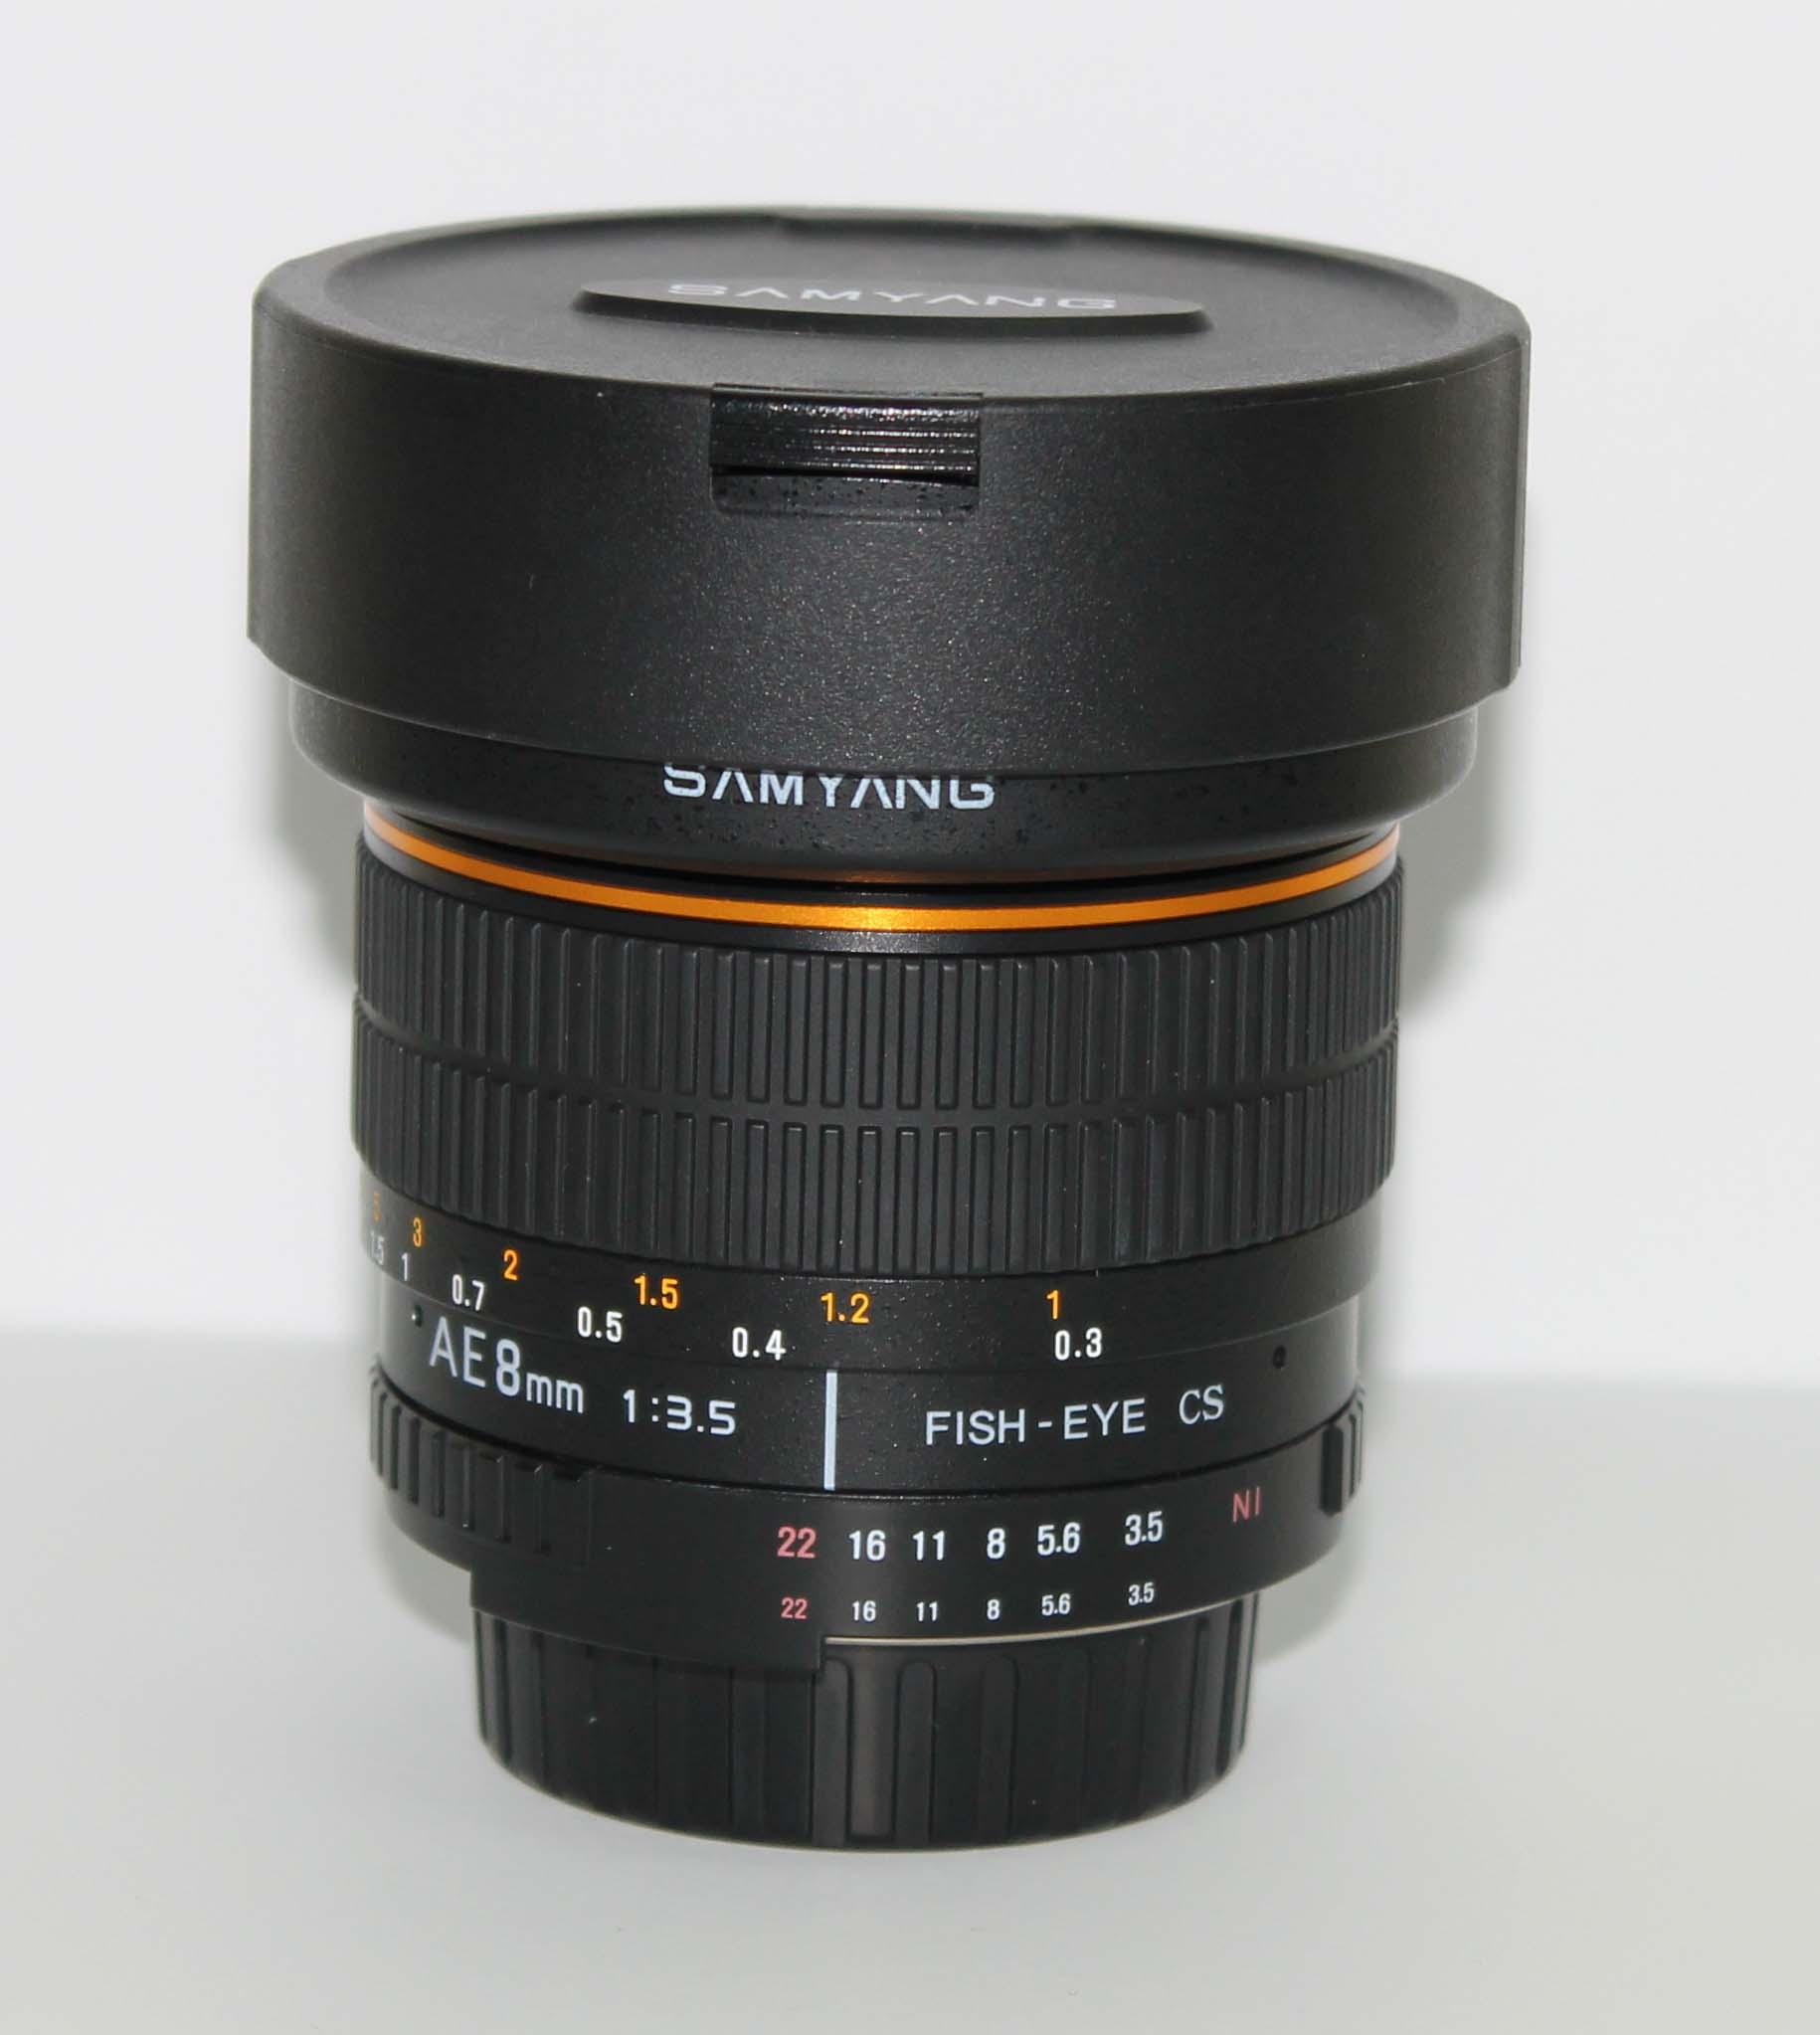 Объектив Samyang MF 8mm f/3.5 AS IF MC Fish-eye CS AE Nikon